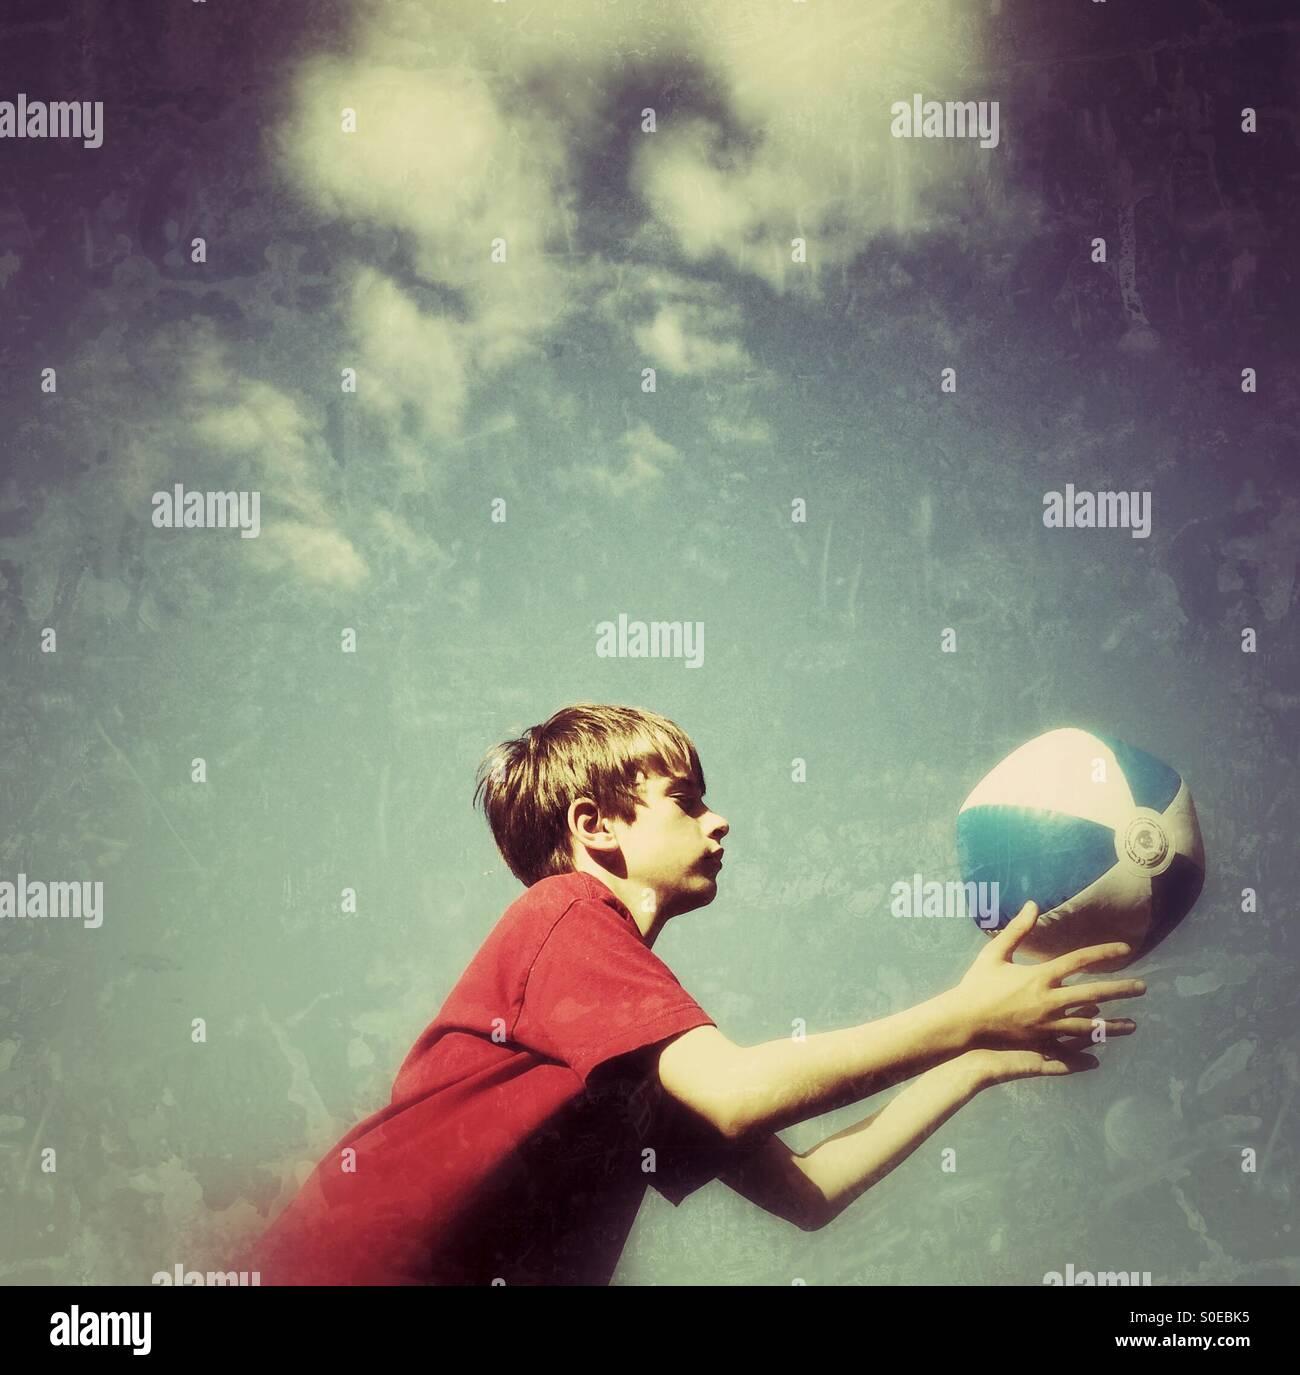 A boy catching a beach ball - Stock Image